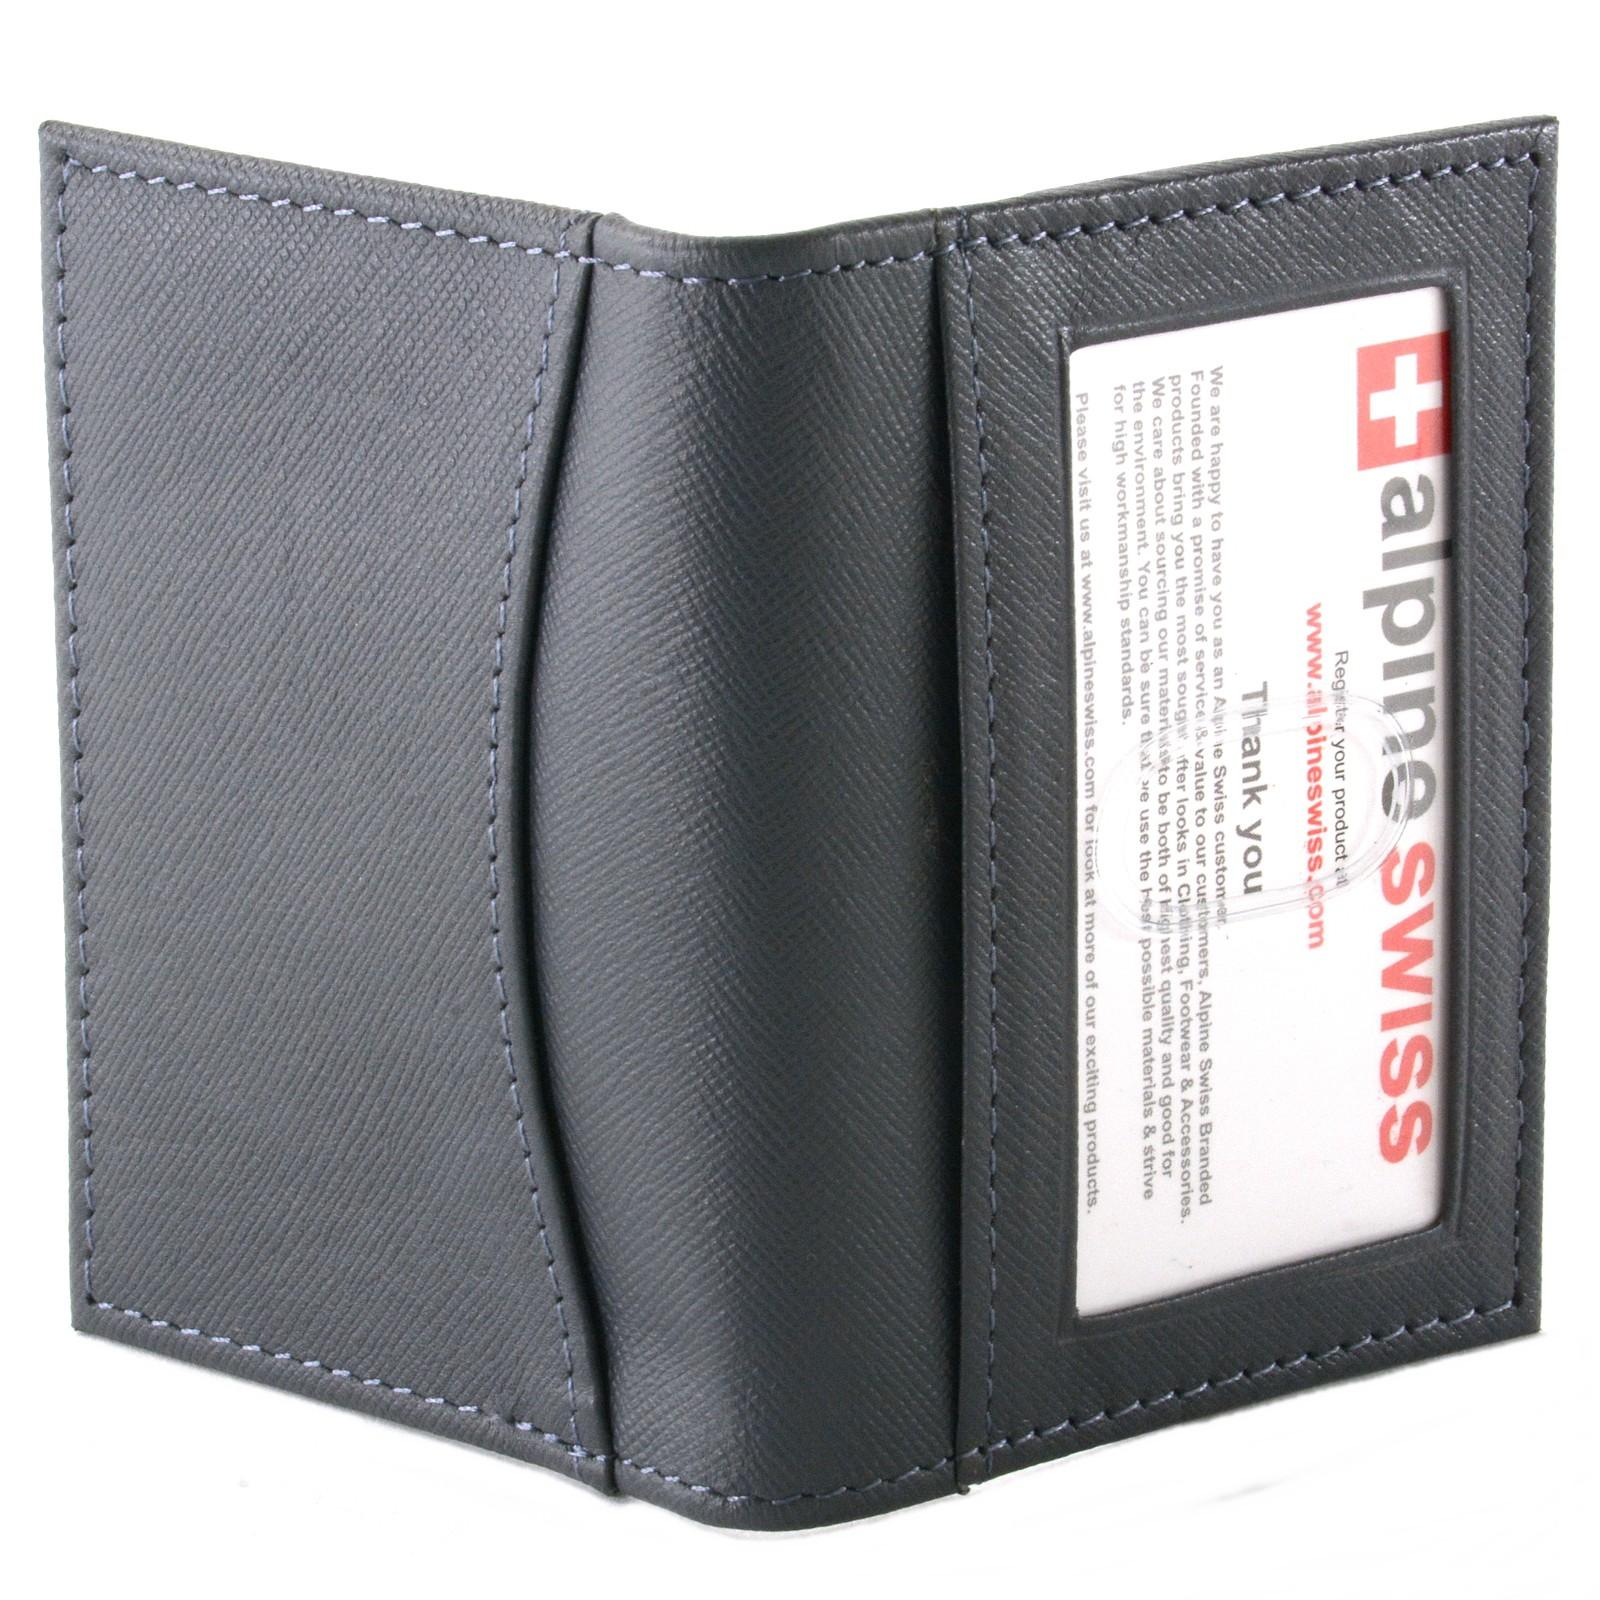 Alpine Swiss Thin Front Pocket Wallet Business Card Case 2 ID Window ...